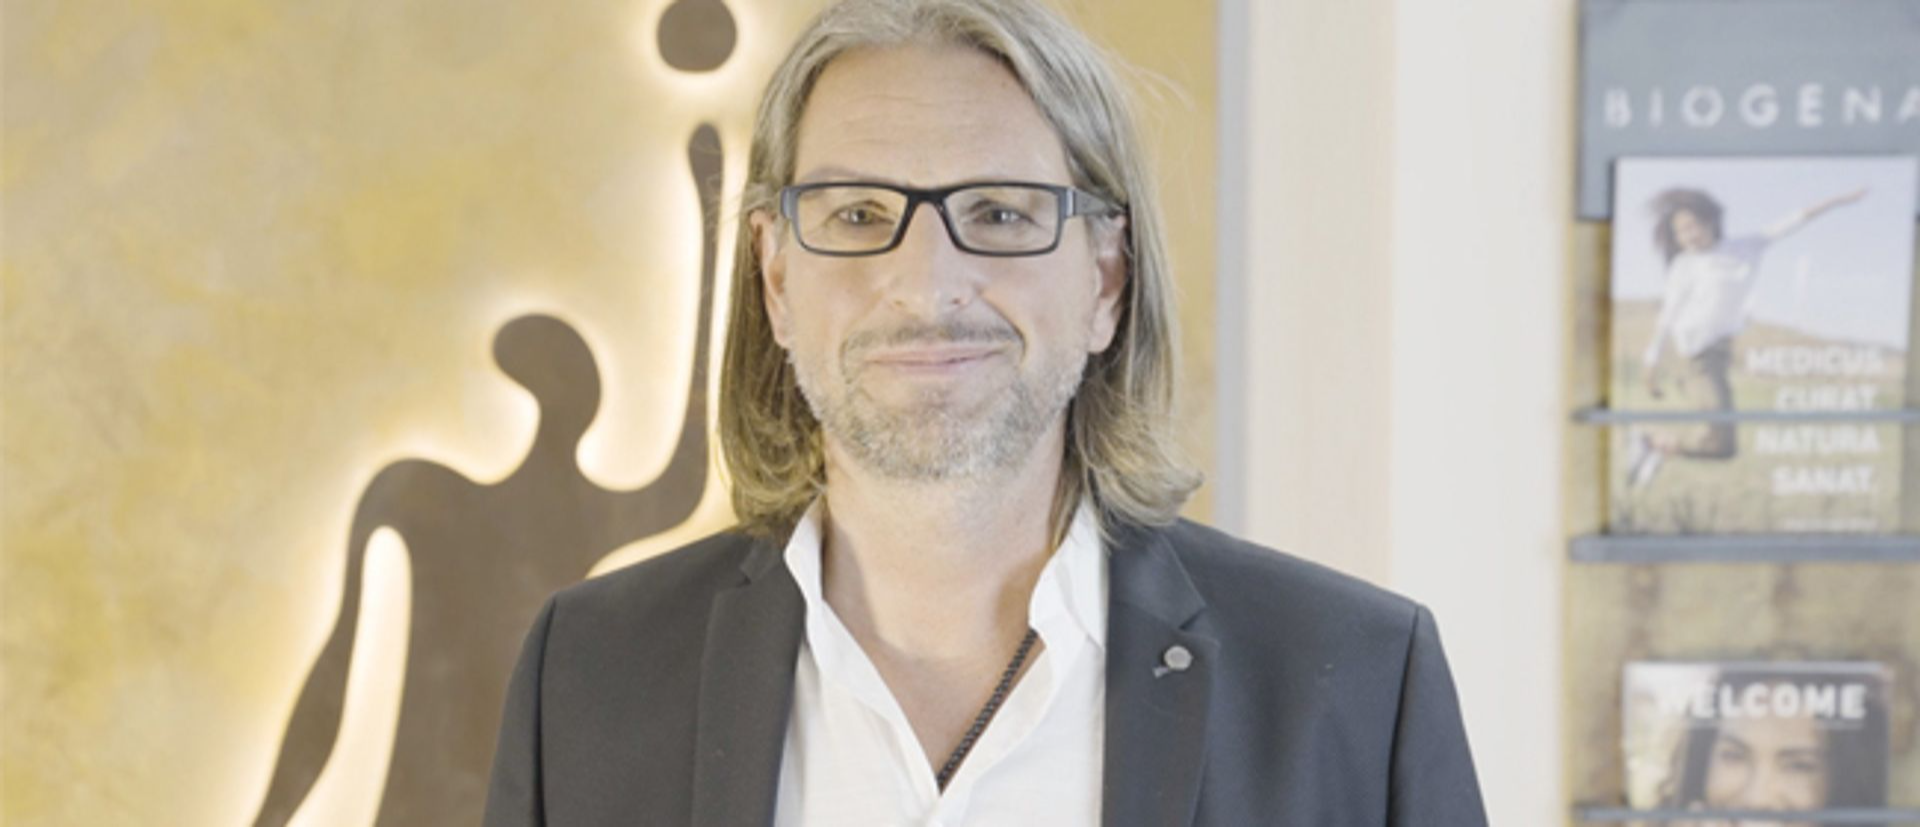 Biogena-Franchise-Partner Jürgen Tanzberger im Portrait